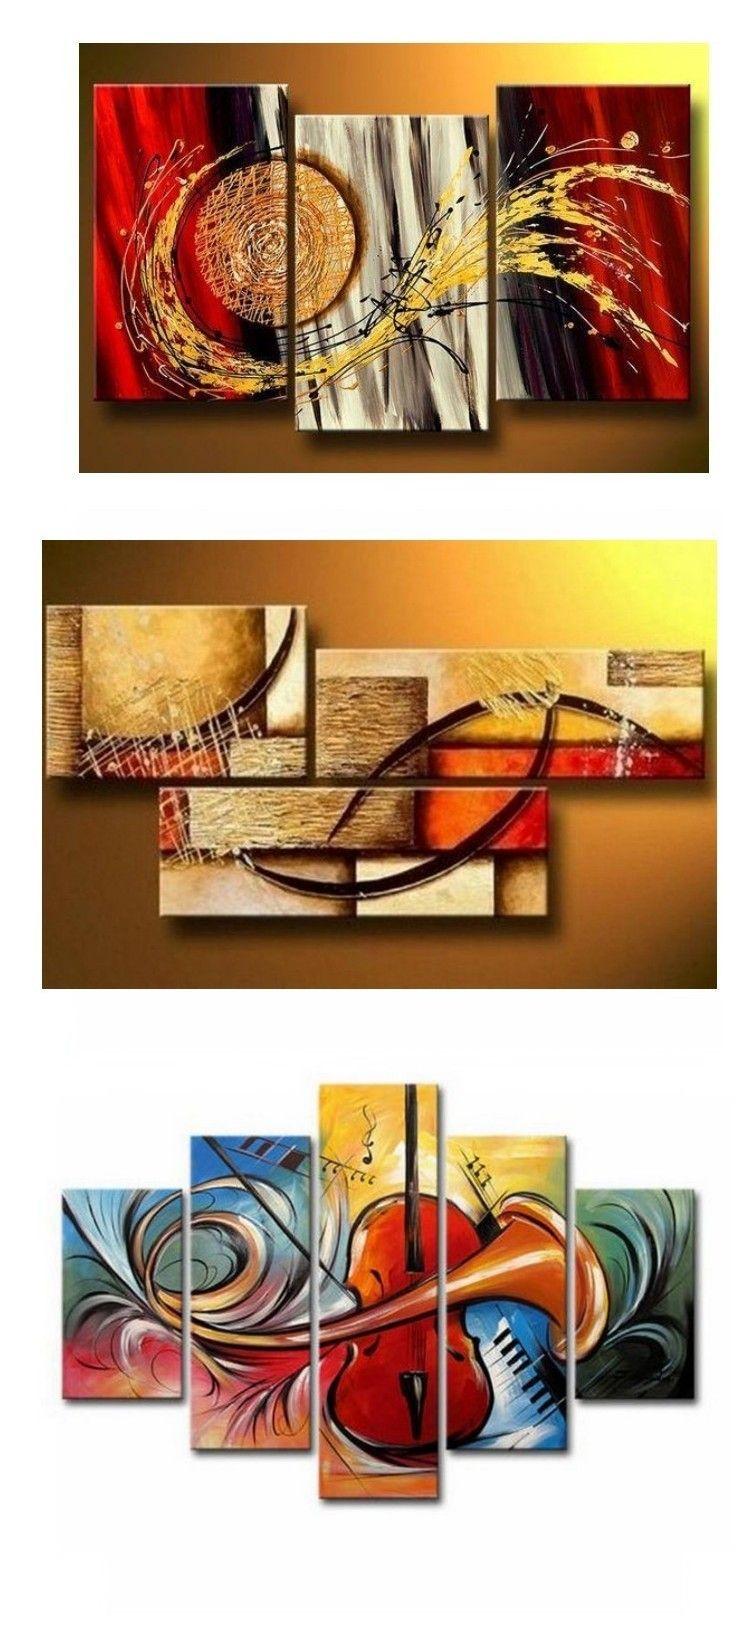 Large Modern Wall Art Painting,Large Abstract wall art,huge canvas painting,original abstract,best wall art,abstract texture art DAC036